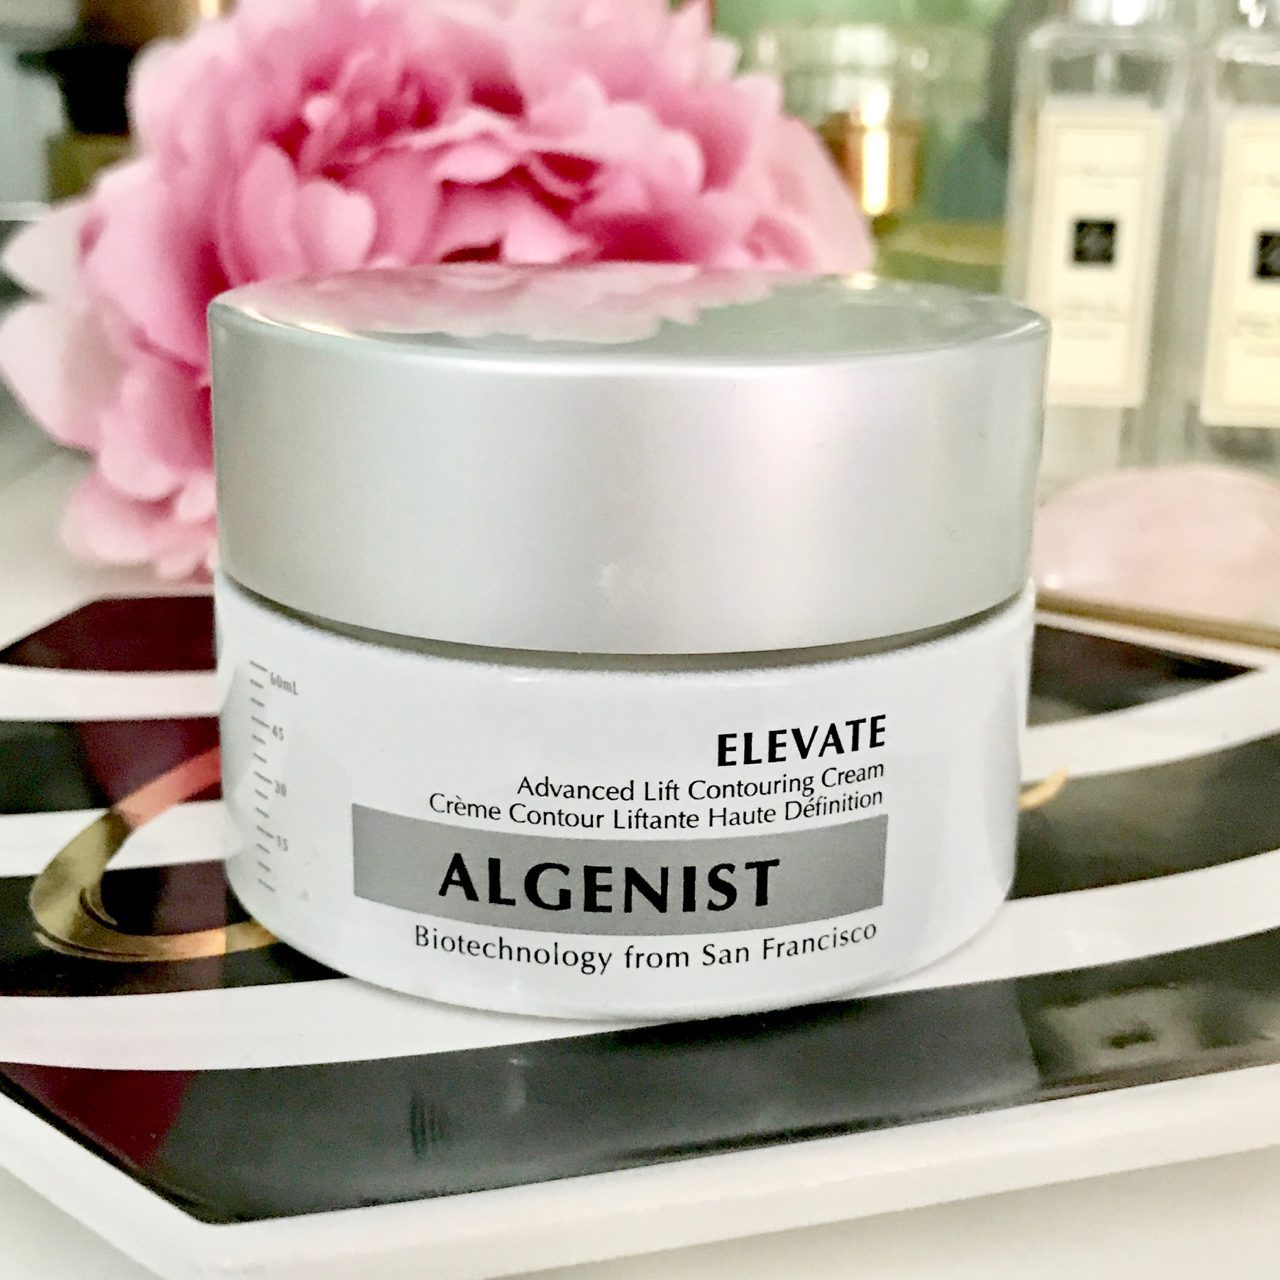 Algenist ELEVATE Advanced Lift Contouring Cream